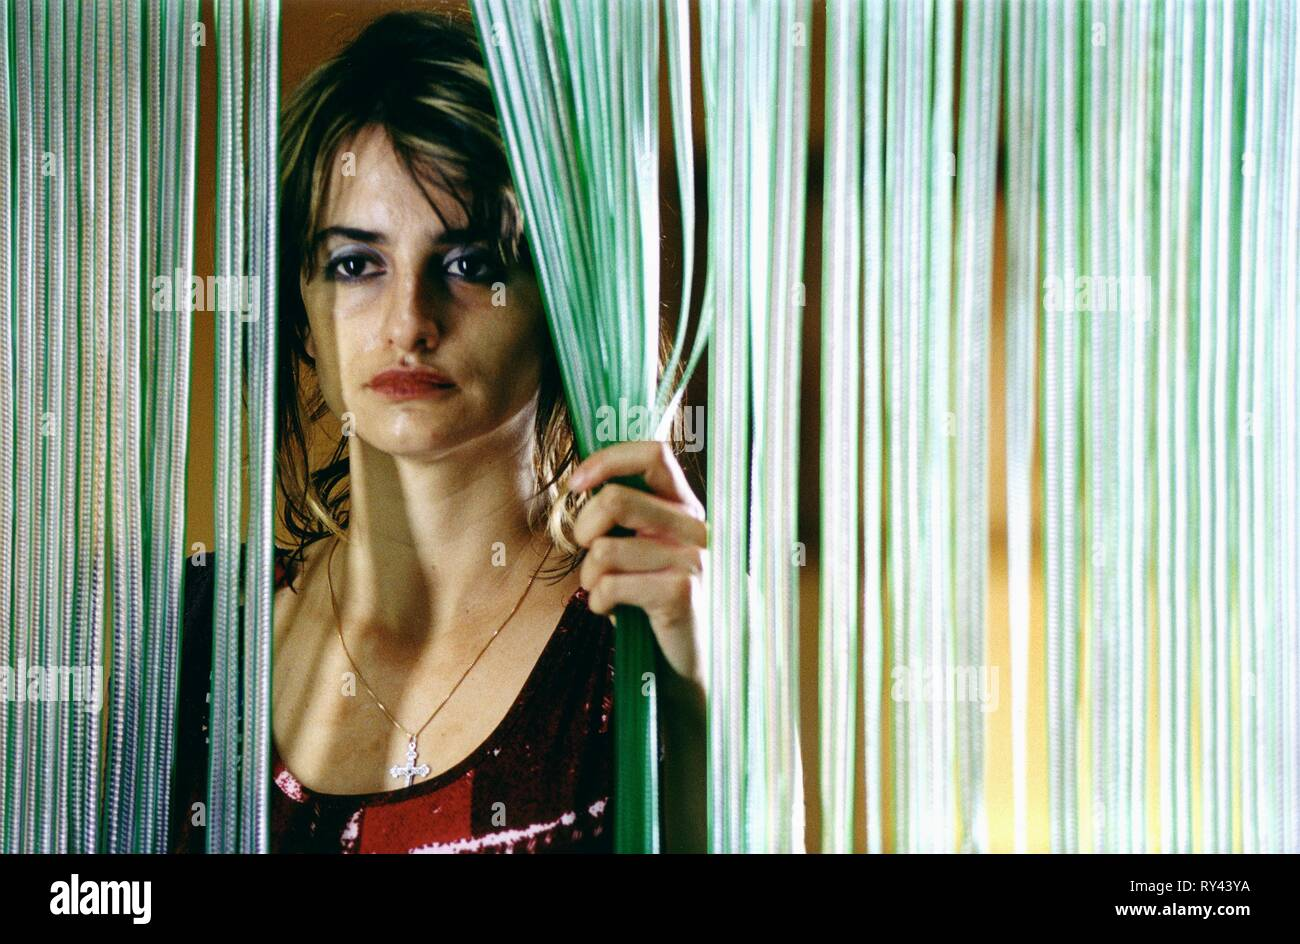 PENELOPE CRUZ, DON'T MOVE, 2004 - Stock Image